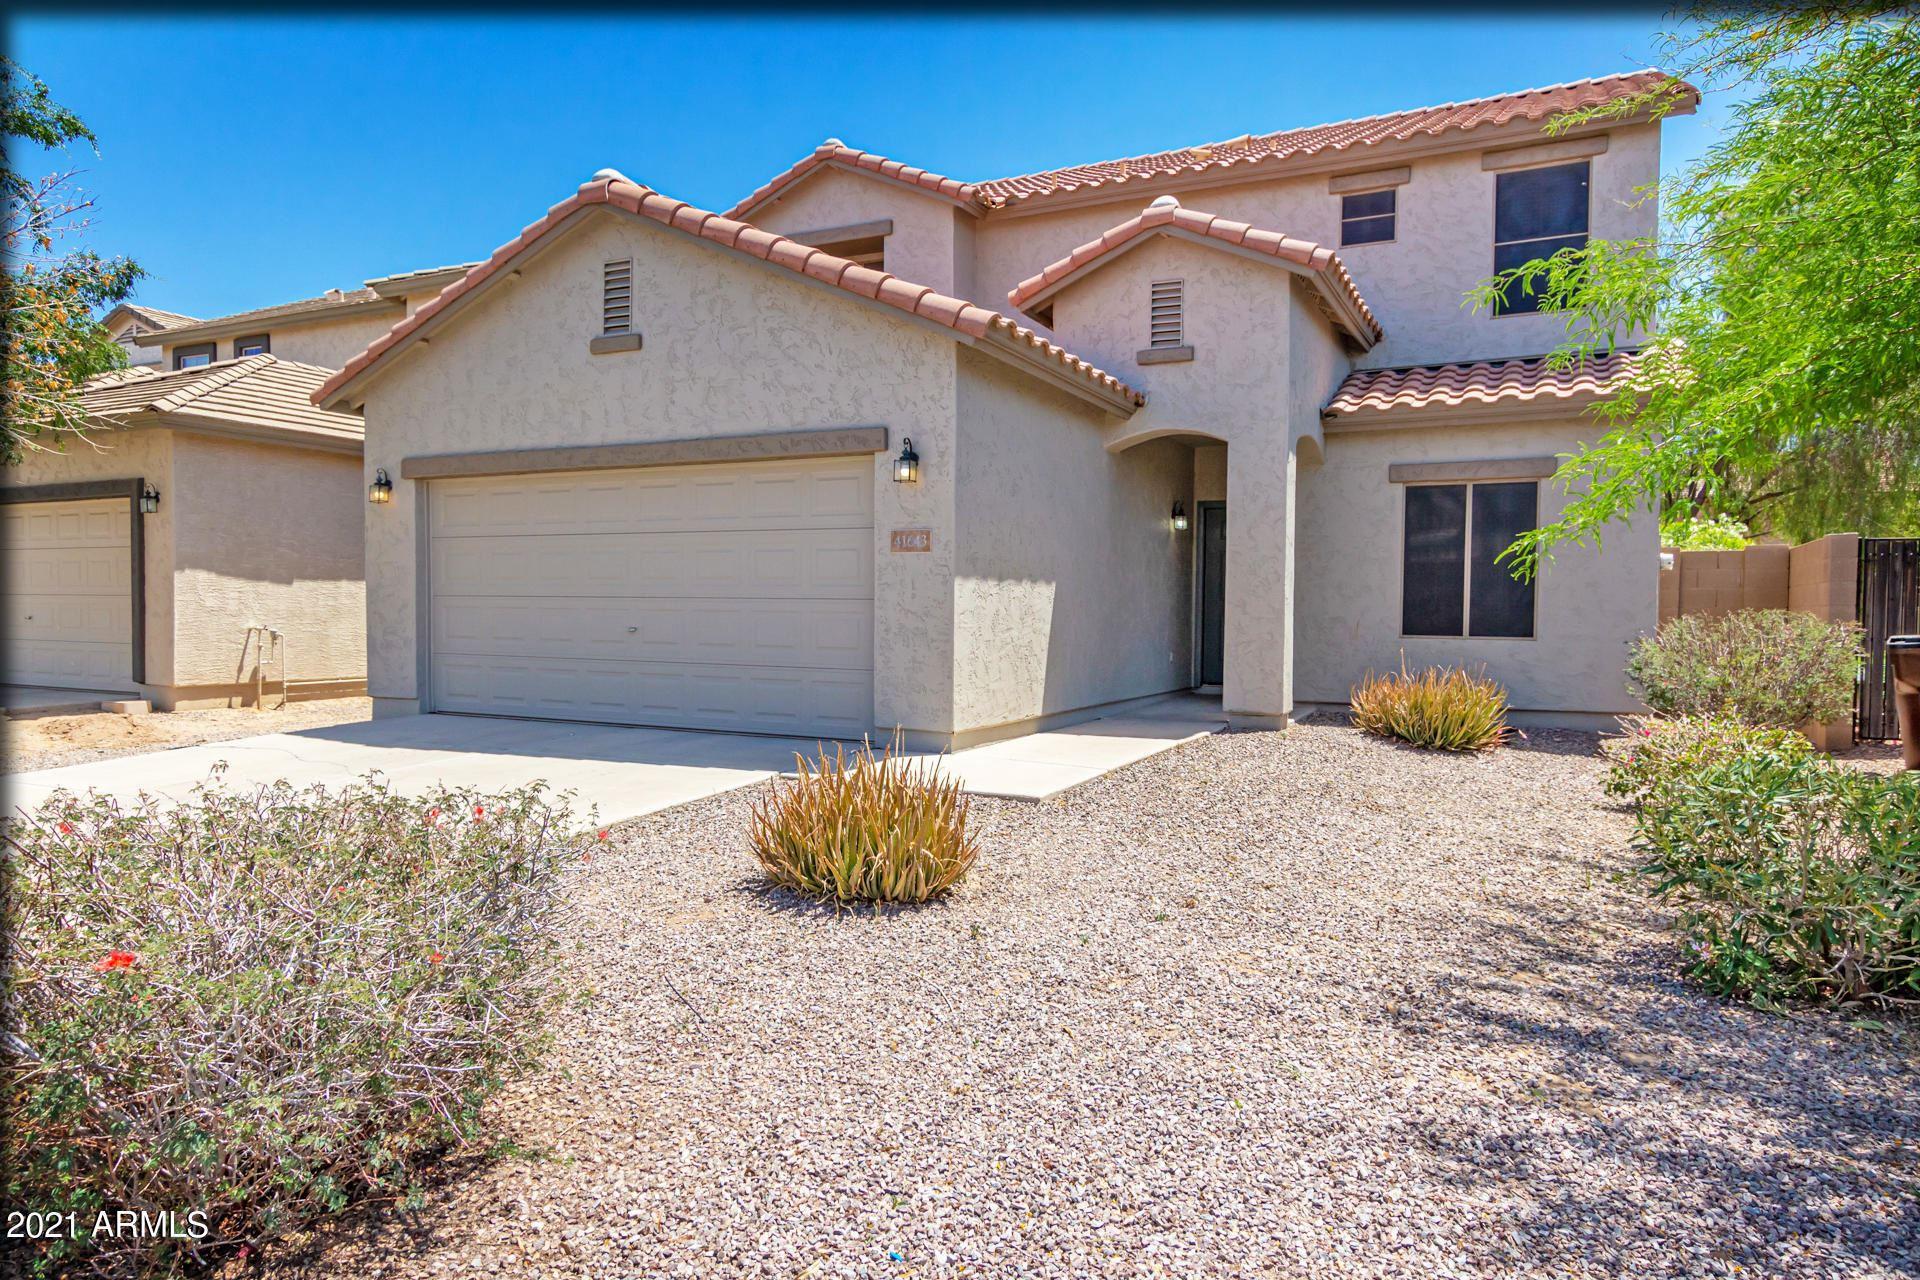 41643 N OETTING Trail, San Tan Valley, AZ 85140 - MLS#: 6230349